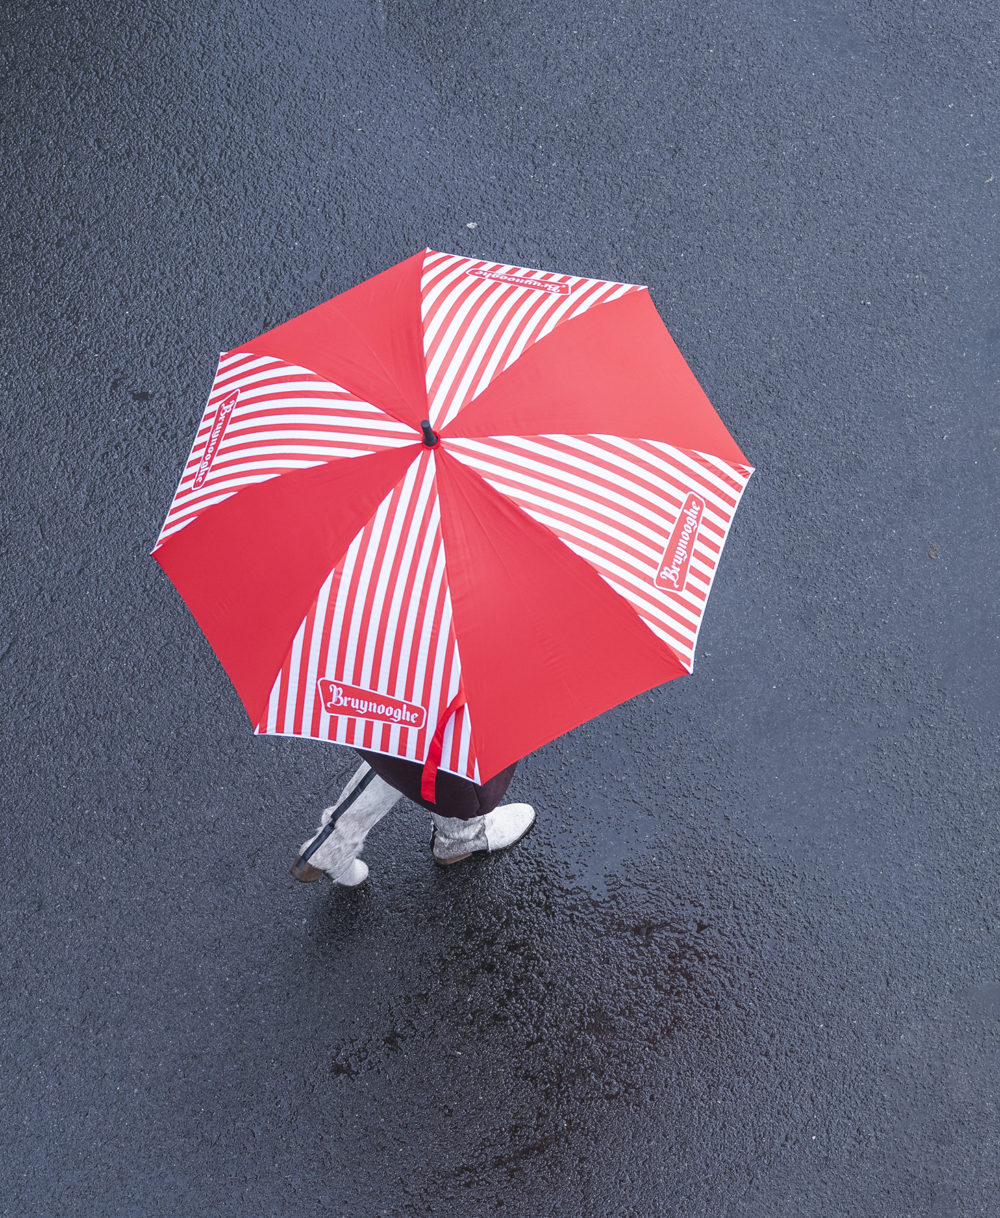 Bruynooghe_paraplu